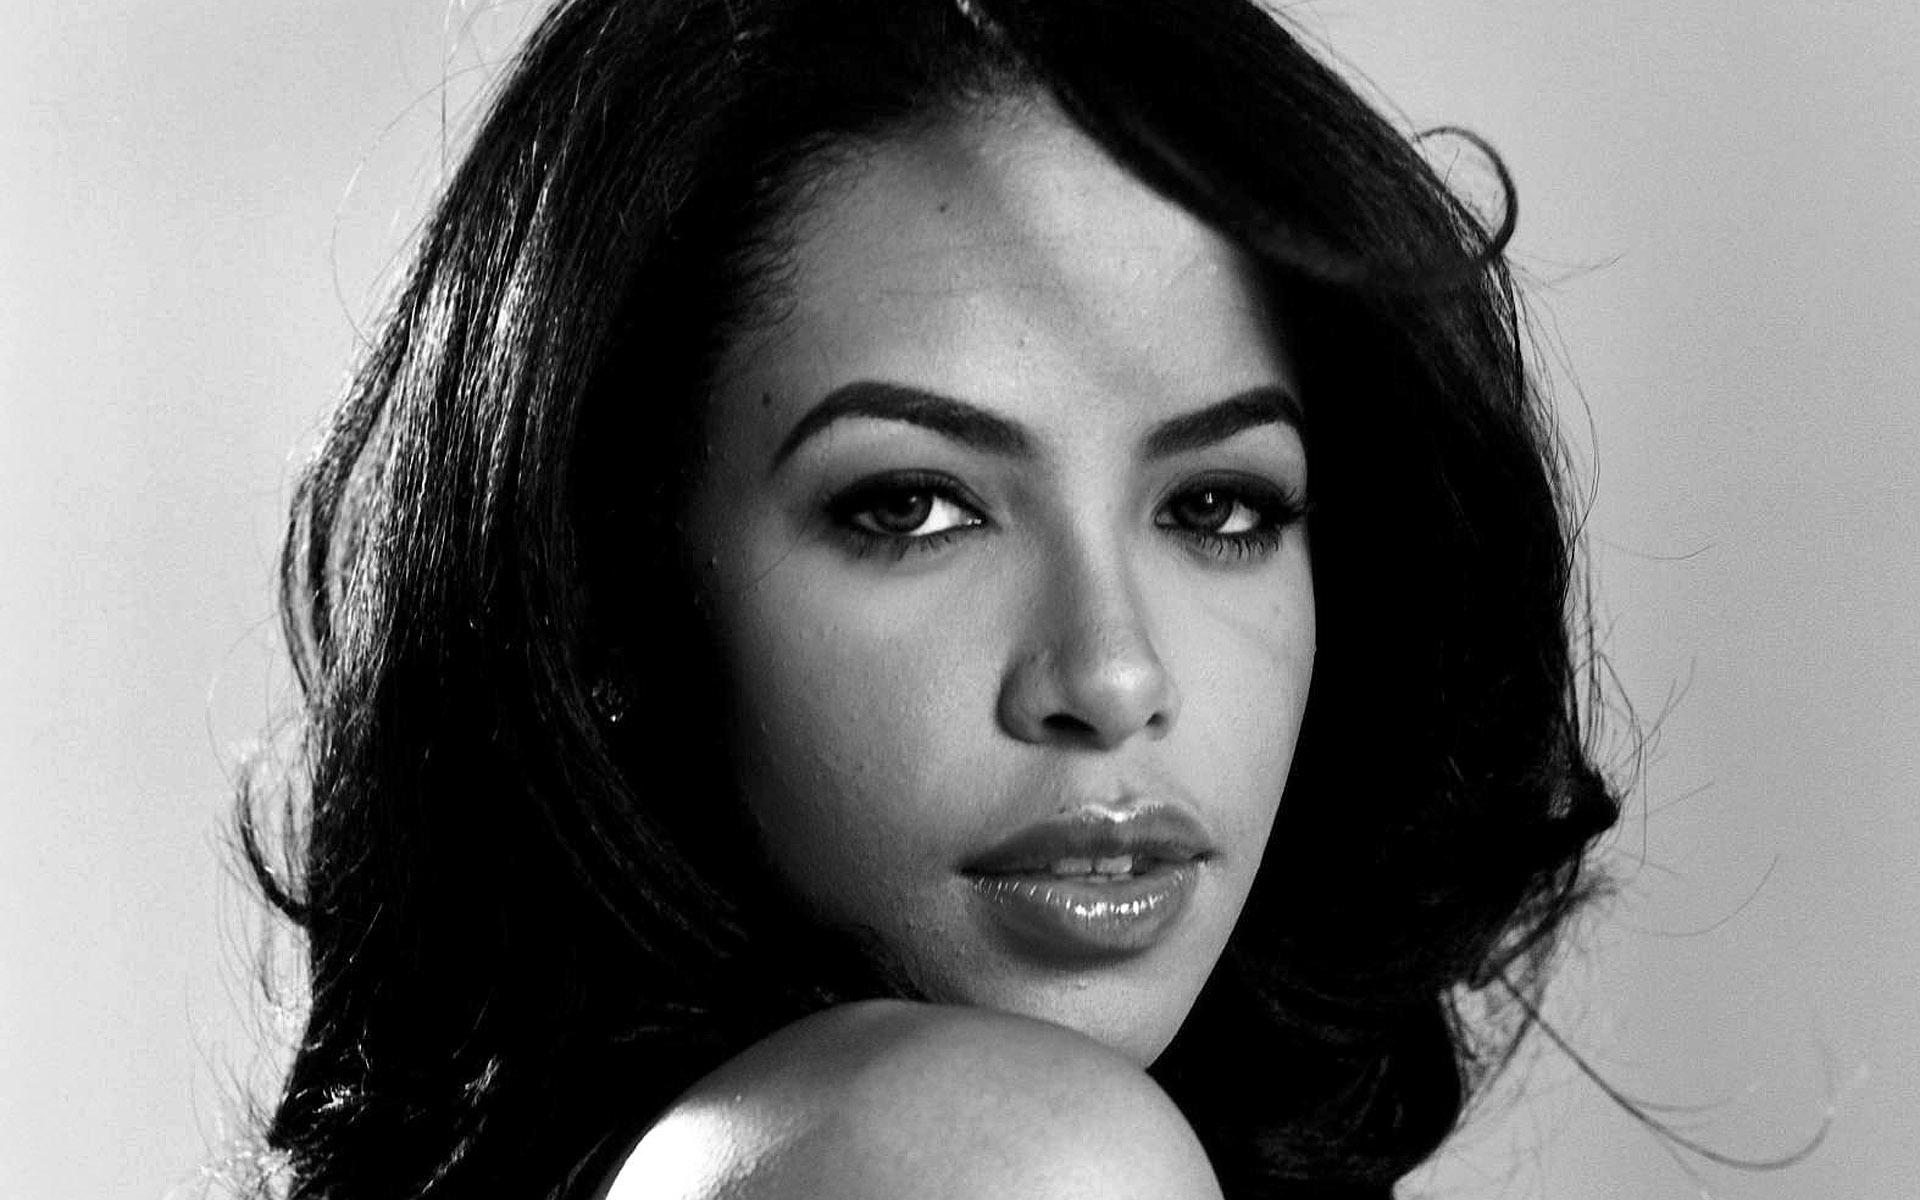 ... Aaliyah · Aaliyah · Aaliyah · Aaliyah